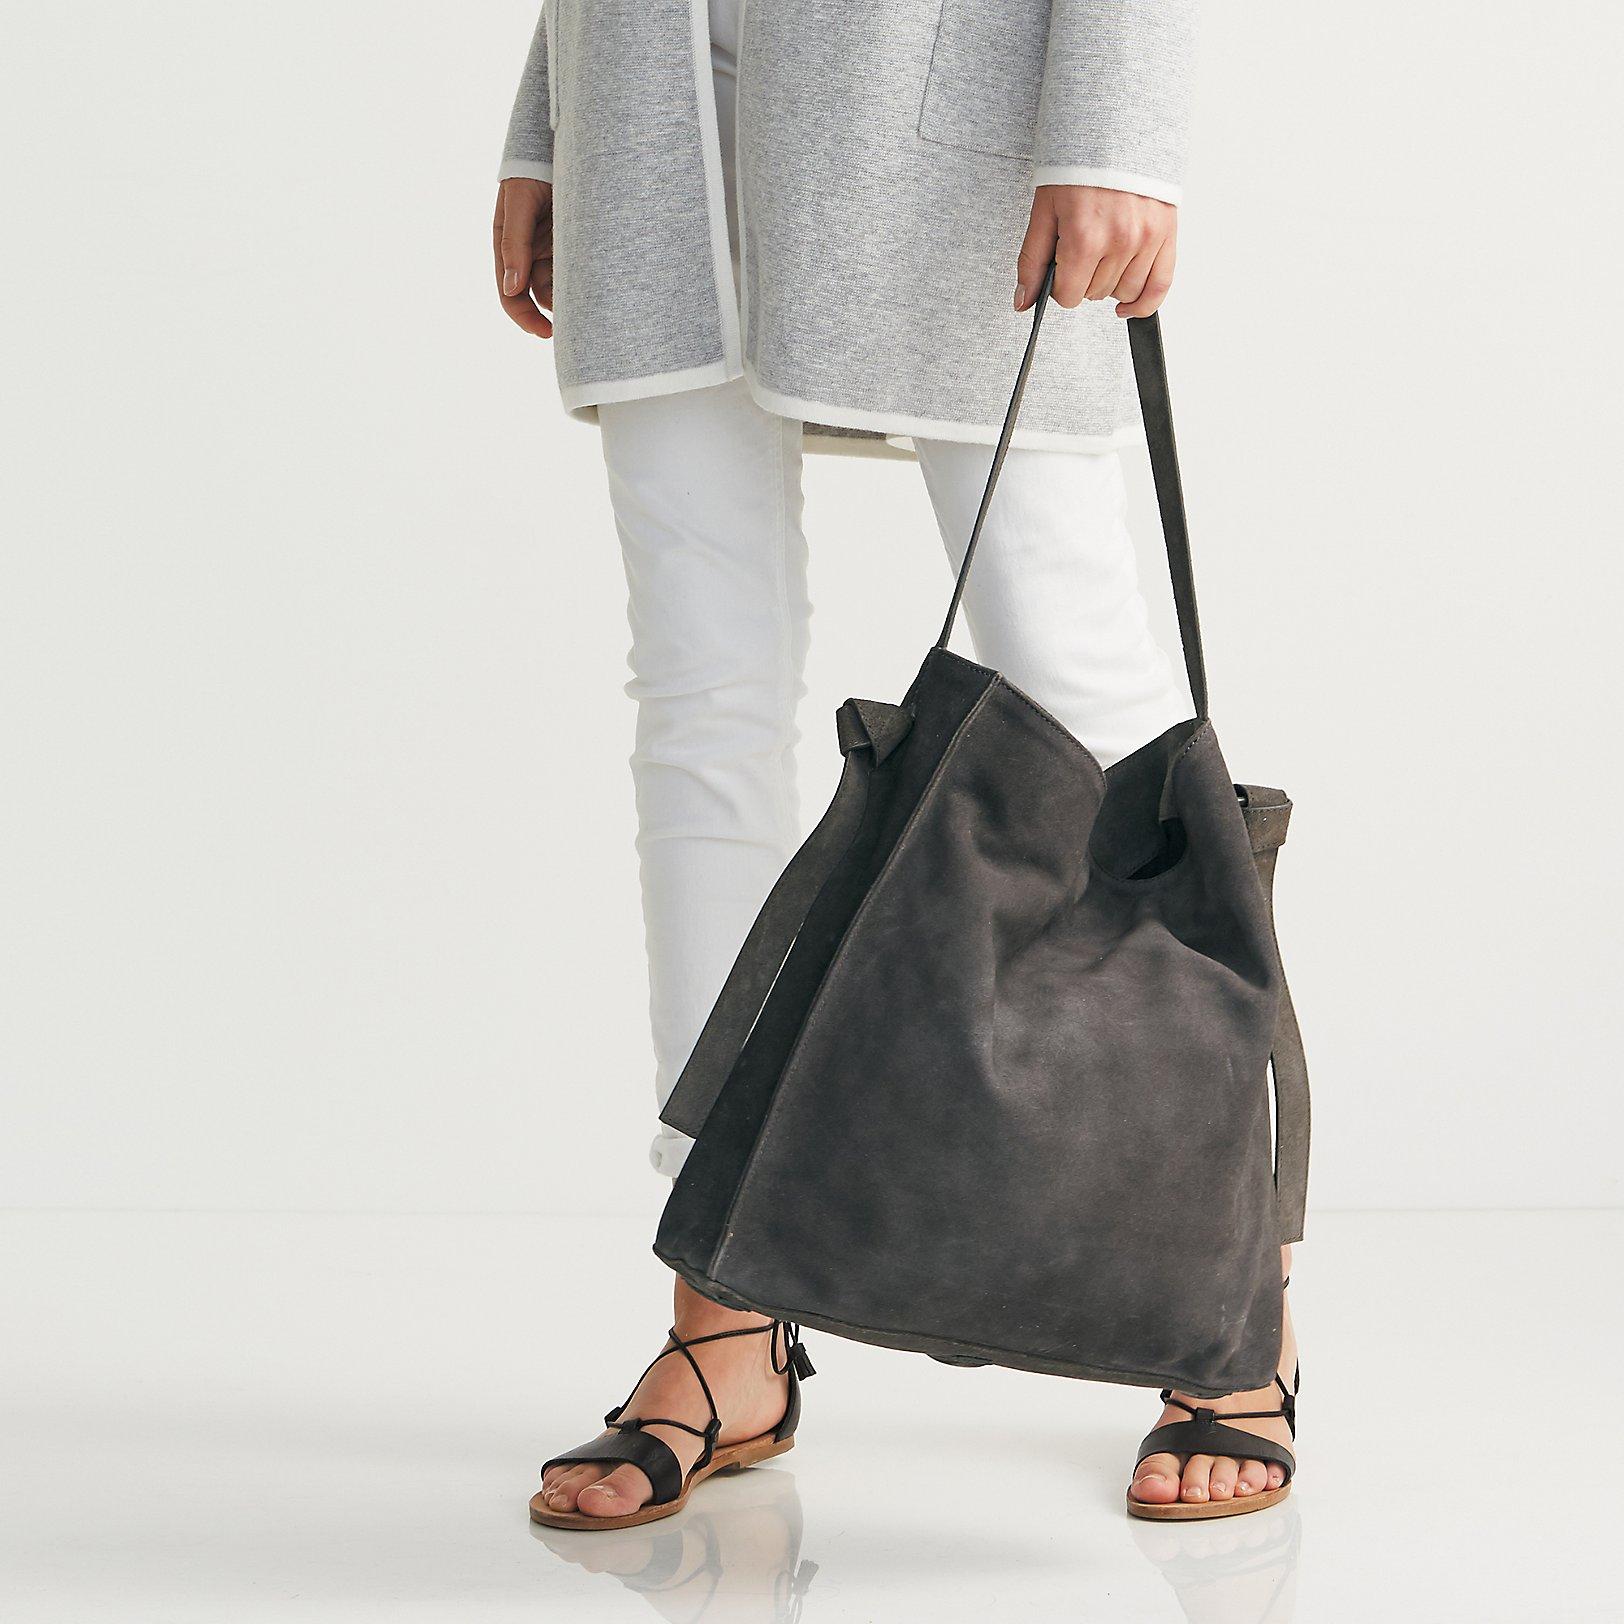 Bags & Purses | Women's Handbags | The White Company UK